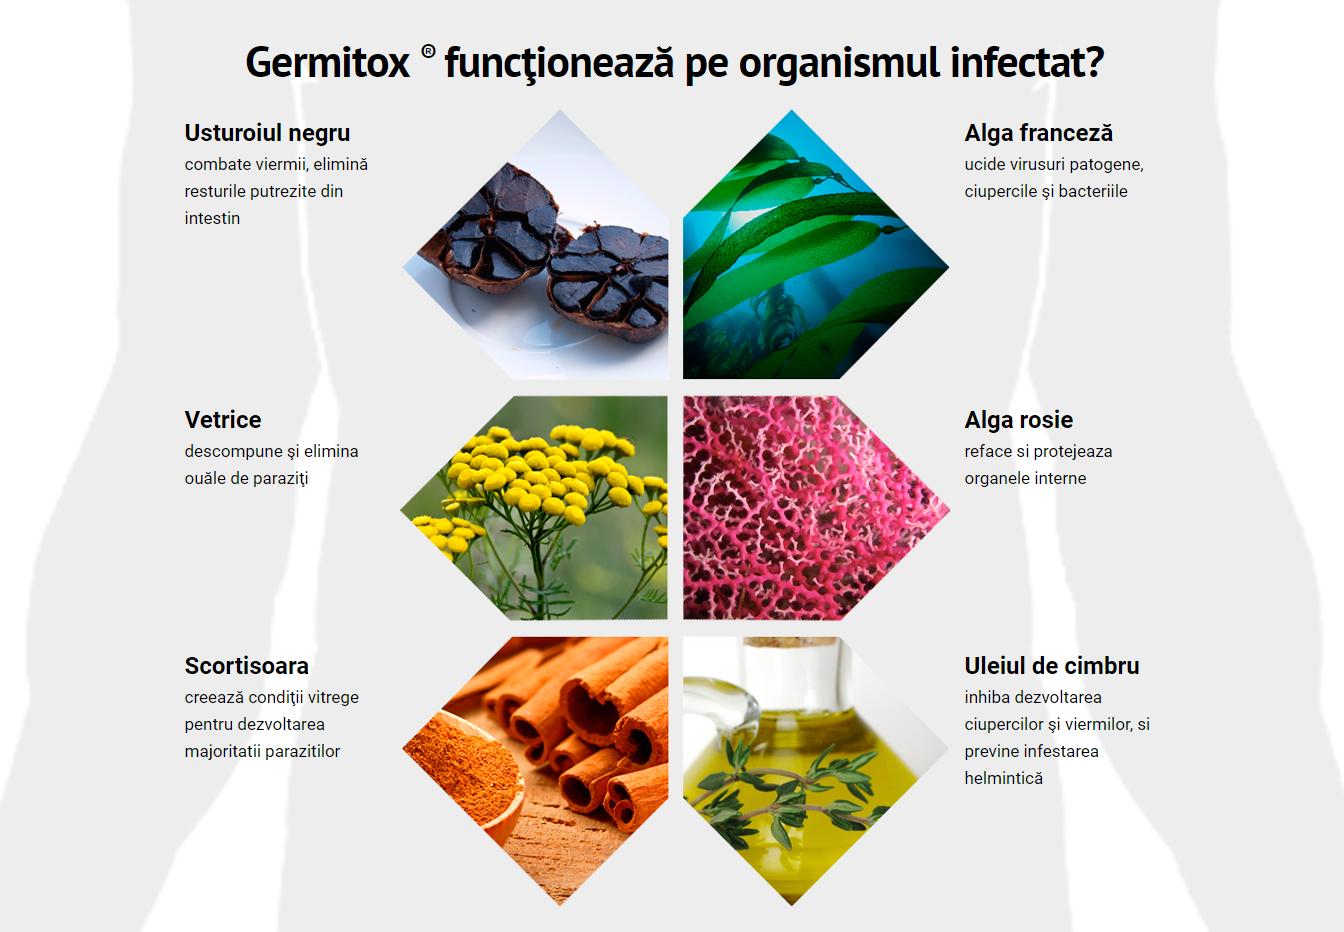 cum de a proteja împotriva paraziților intestinali hpv virus zonder wratten